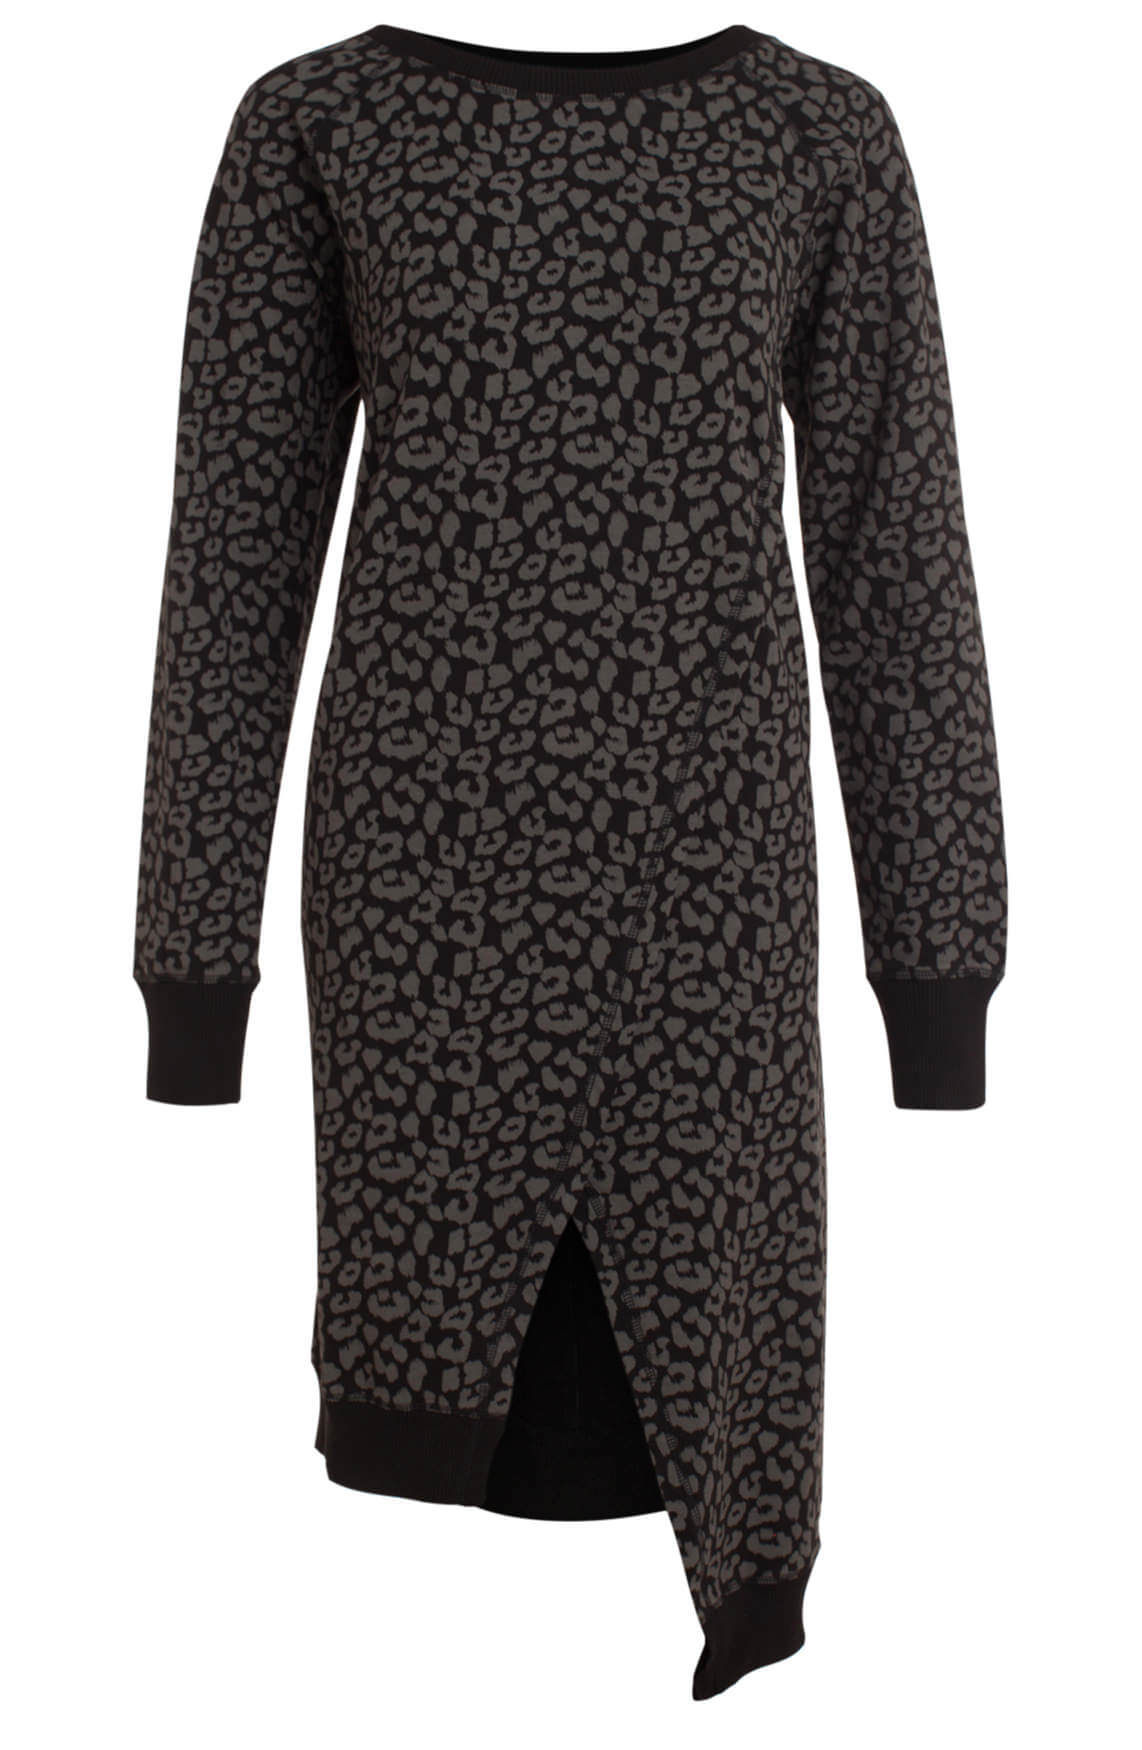 973bfe976c4dbd 10 Days Dames Panterprint jurk met overslag zwart